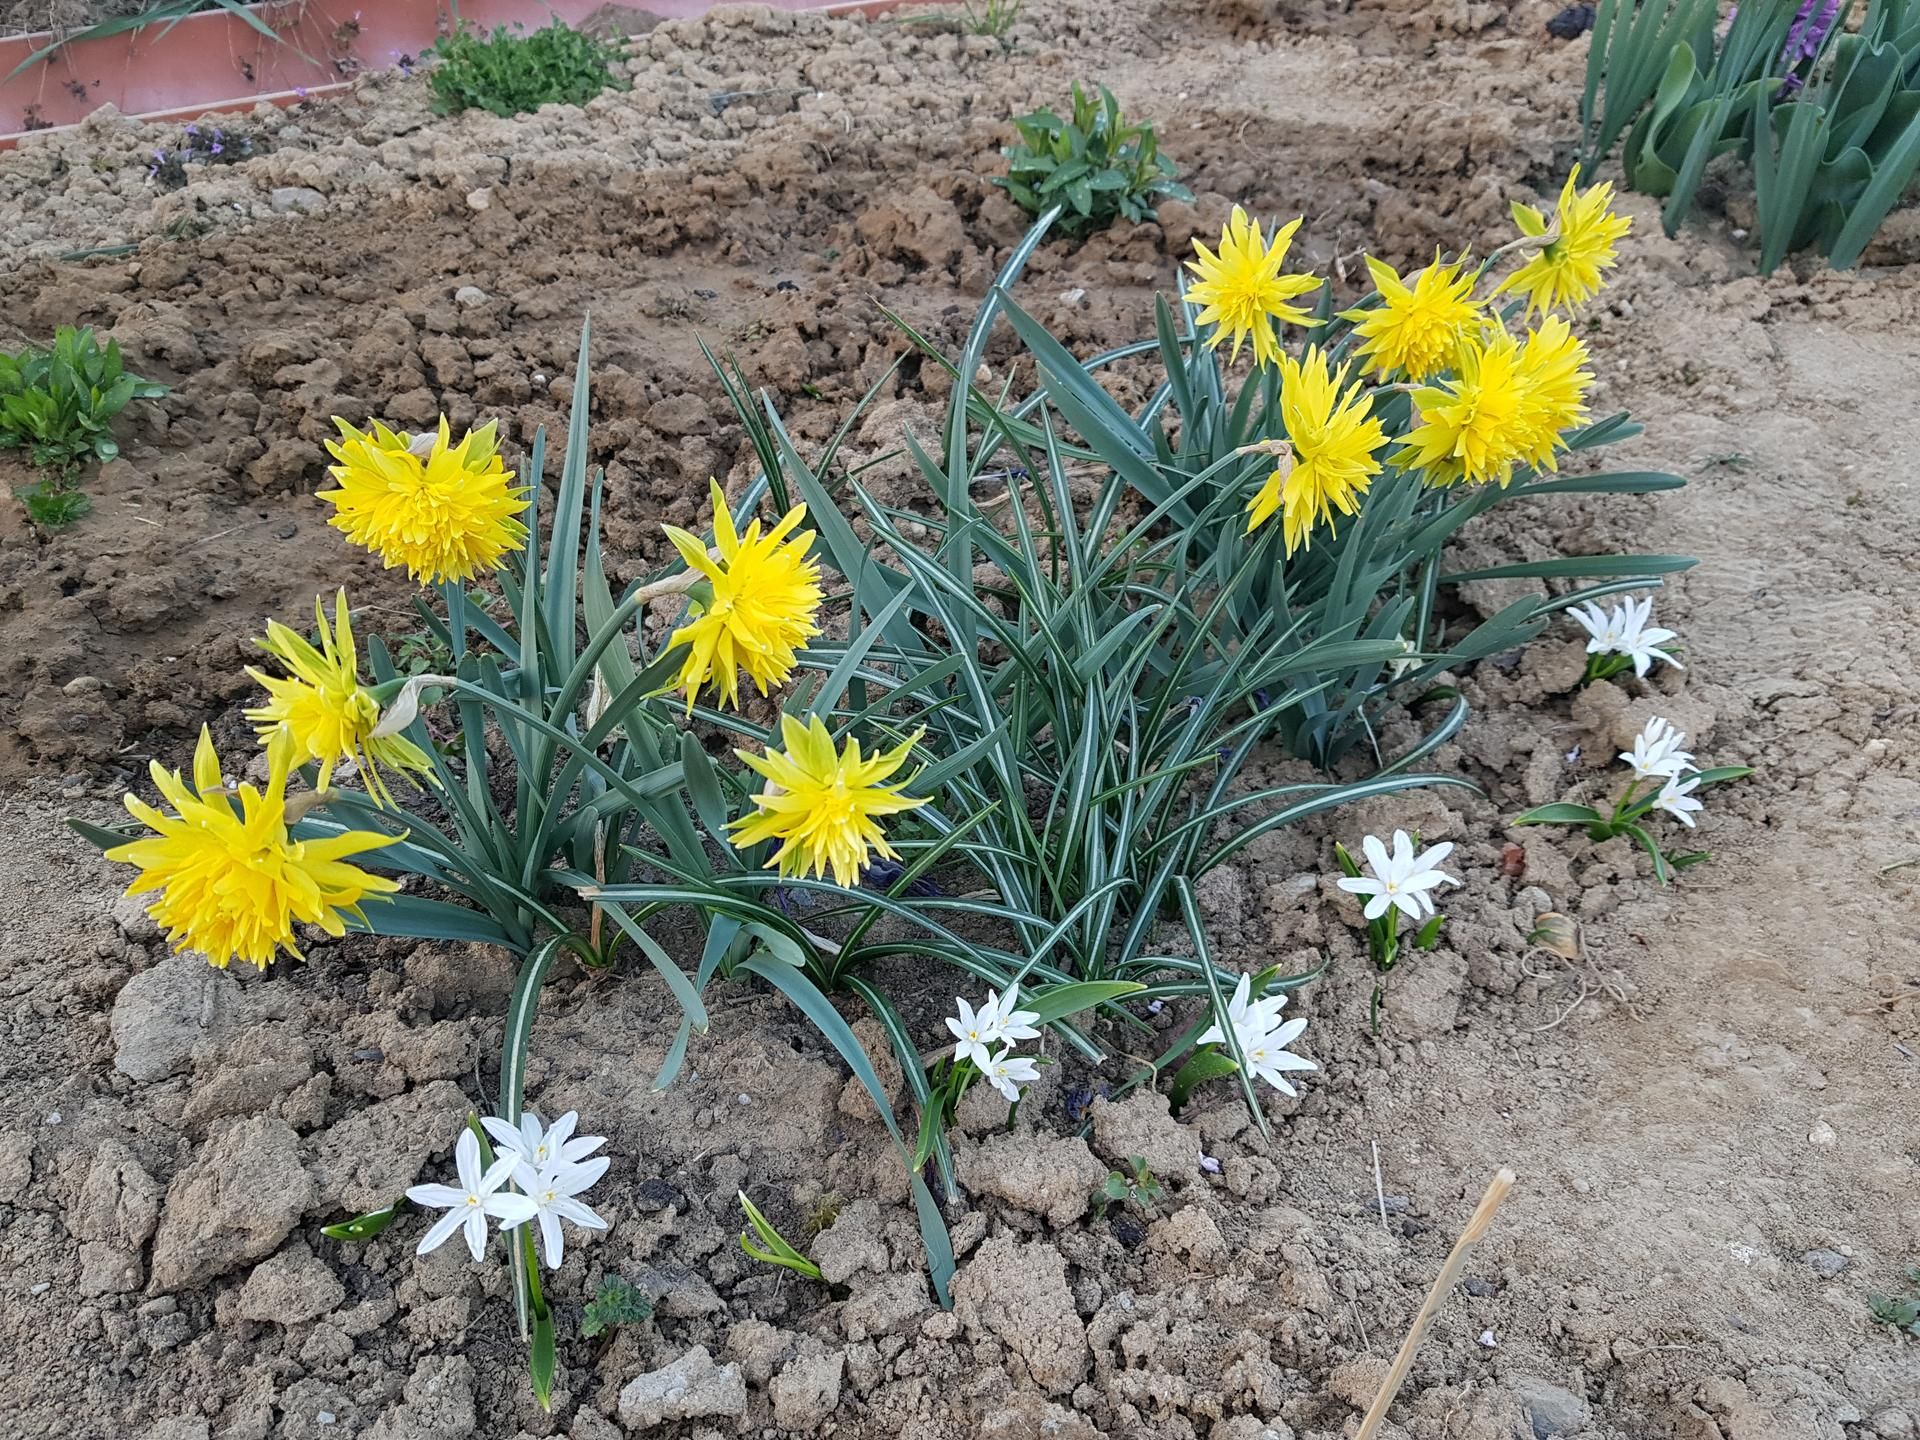 Okrasne zahony - narcis Rip van winkle a modravka ziariva (biela)